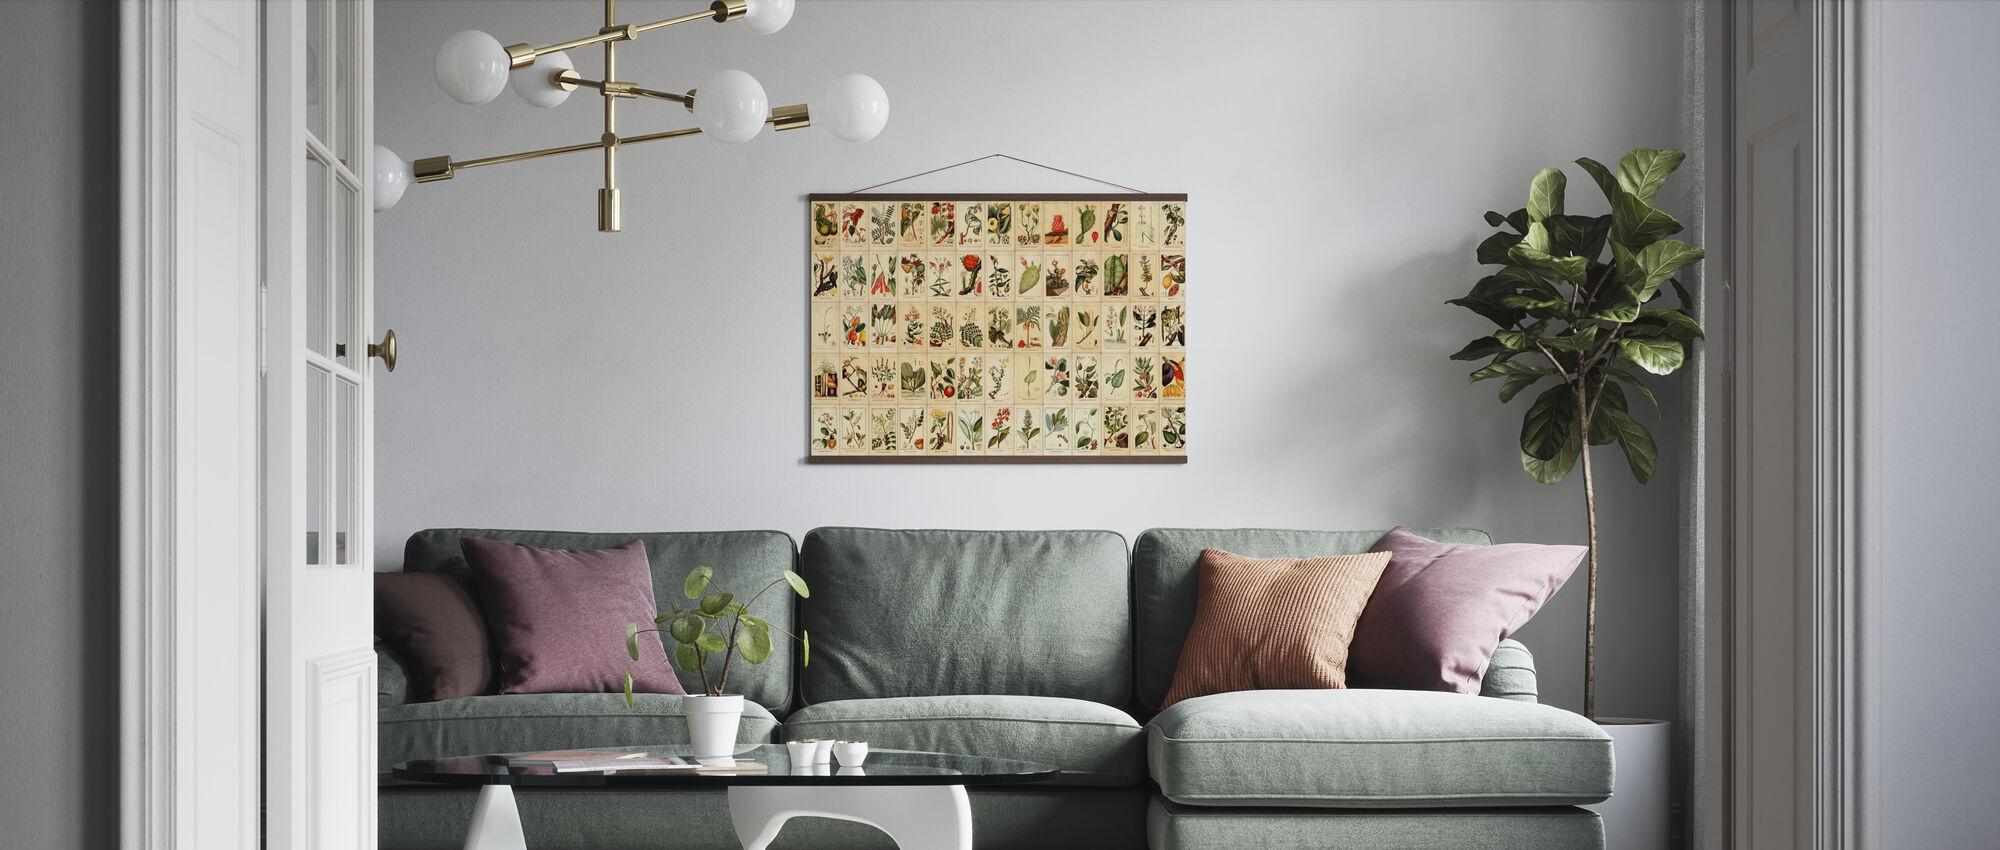 Vegan Is - Poster - Living Room